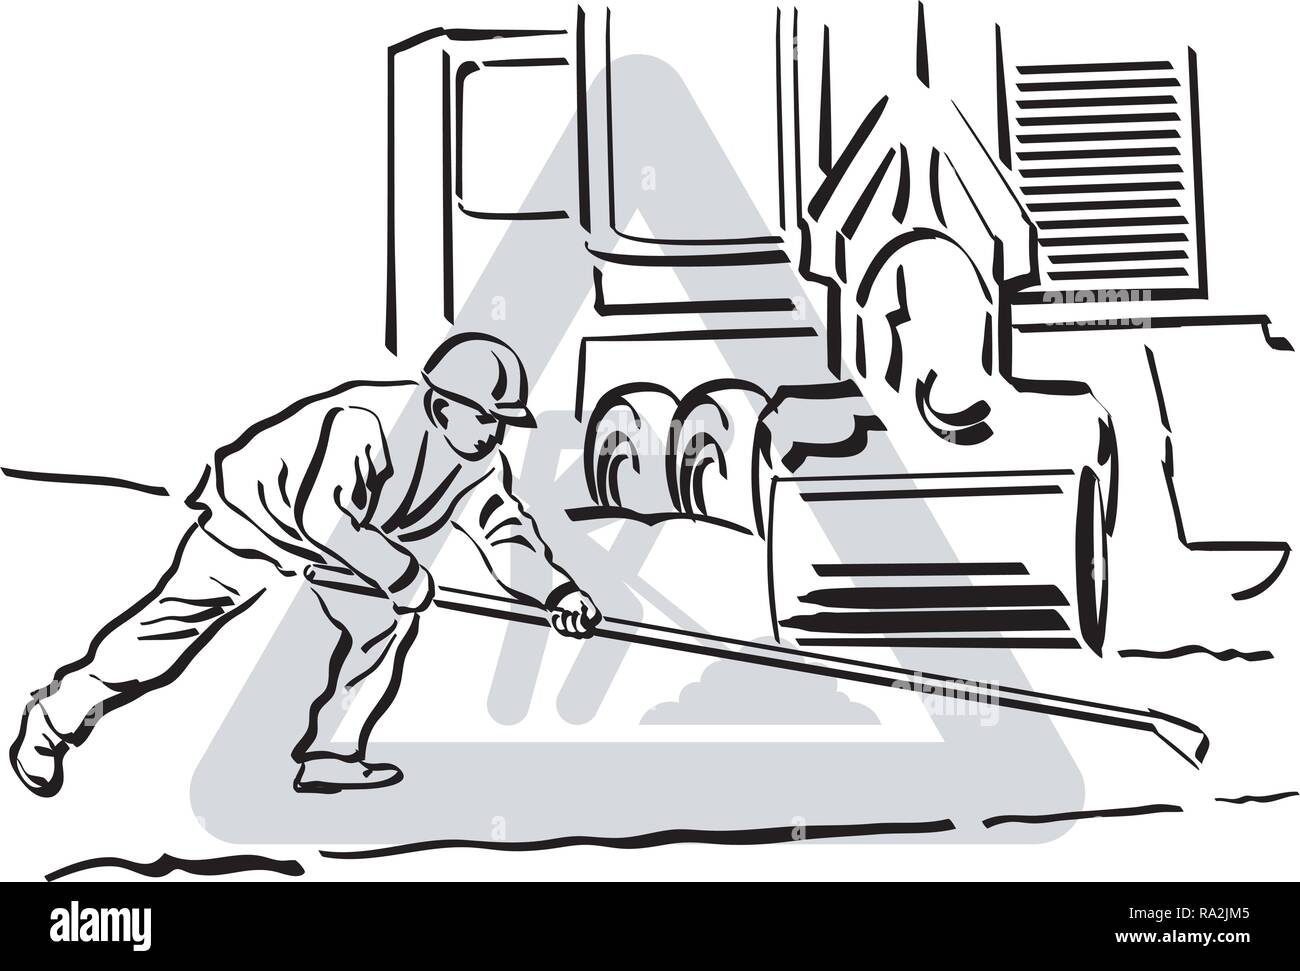 A vector illustration of an asphalt worker at work. - Stock Image